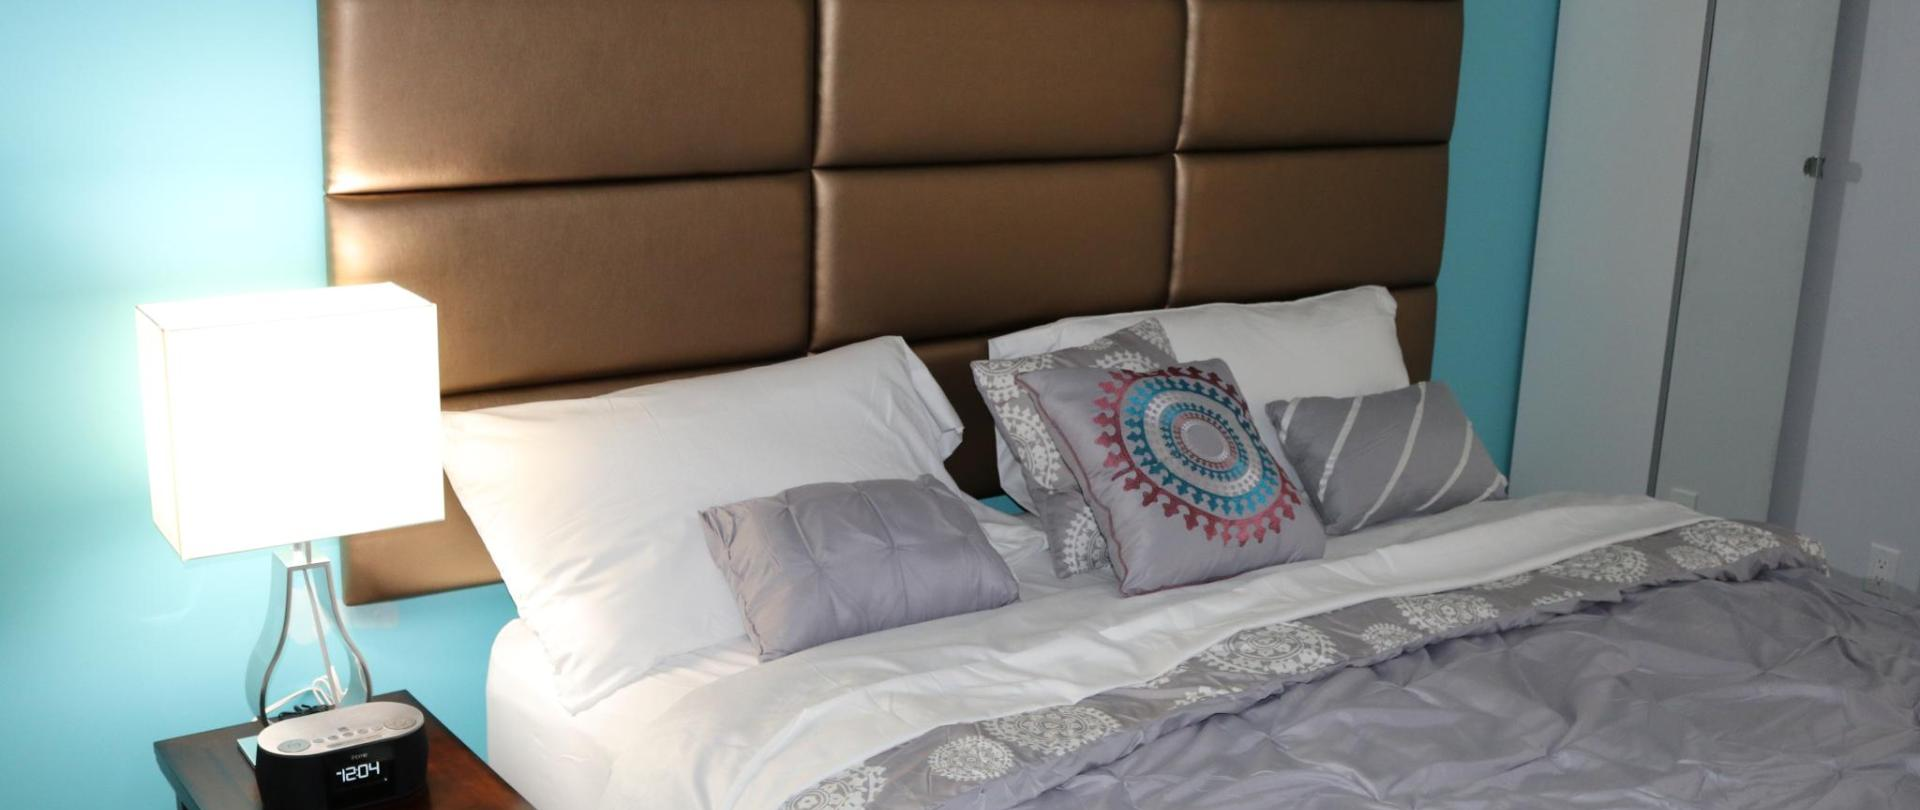 https://www.hotelsbyday.com/_data/default-hotel_image/1/8830/38542364.jpg